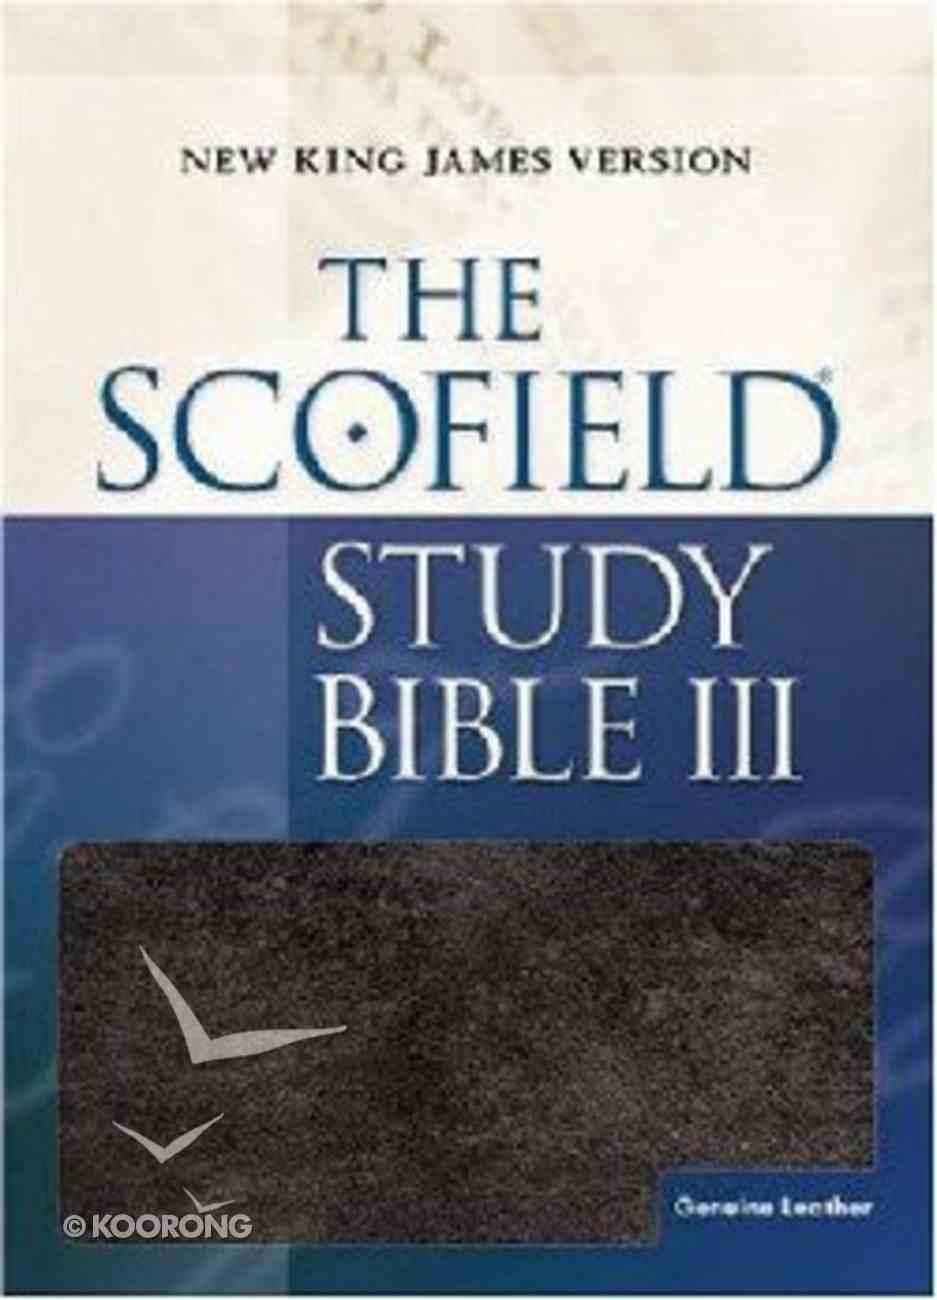 NKJV Scofield III Study Bible Burgundy Genuine Leather